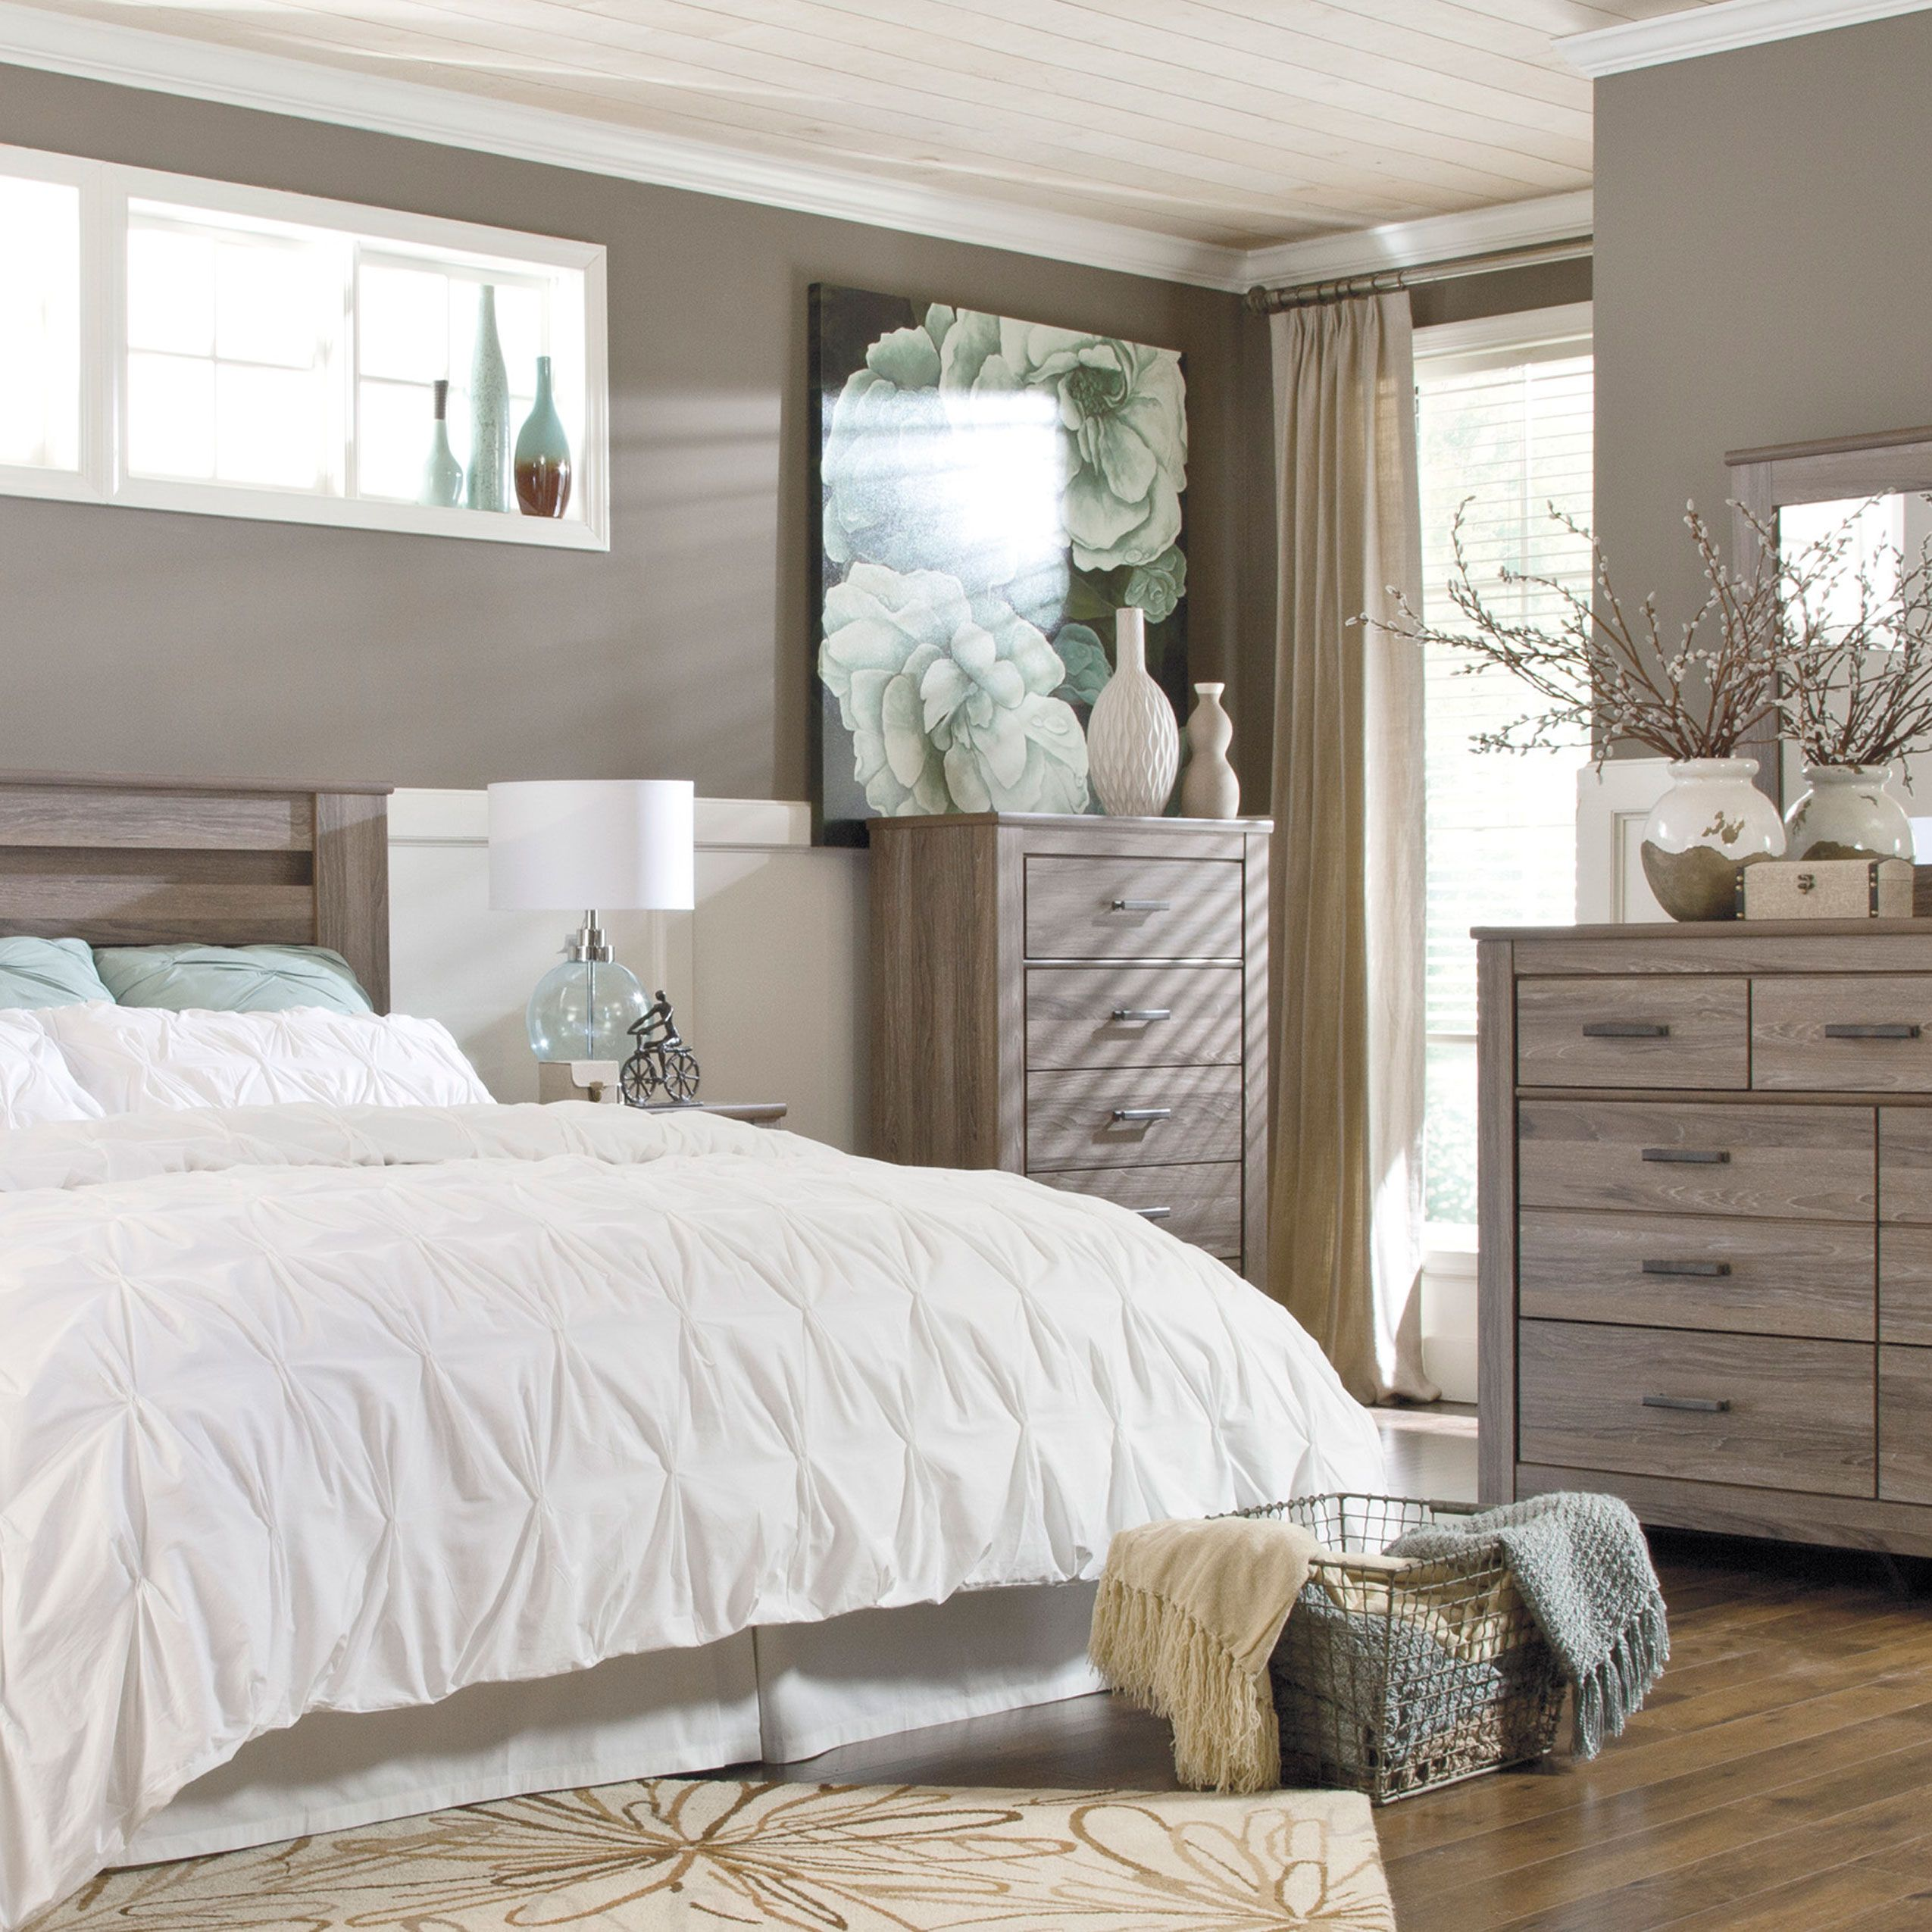 Zelen Queen Bedroom Group by Signature Design by Ashley